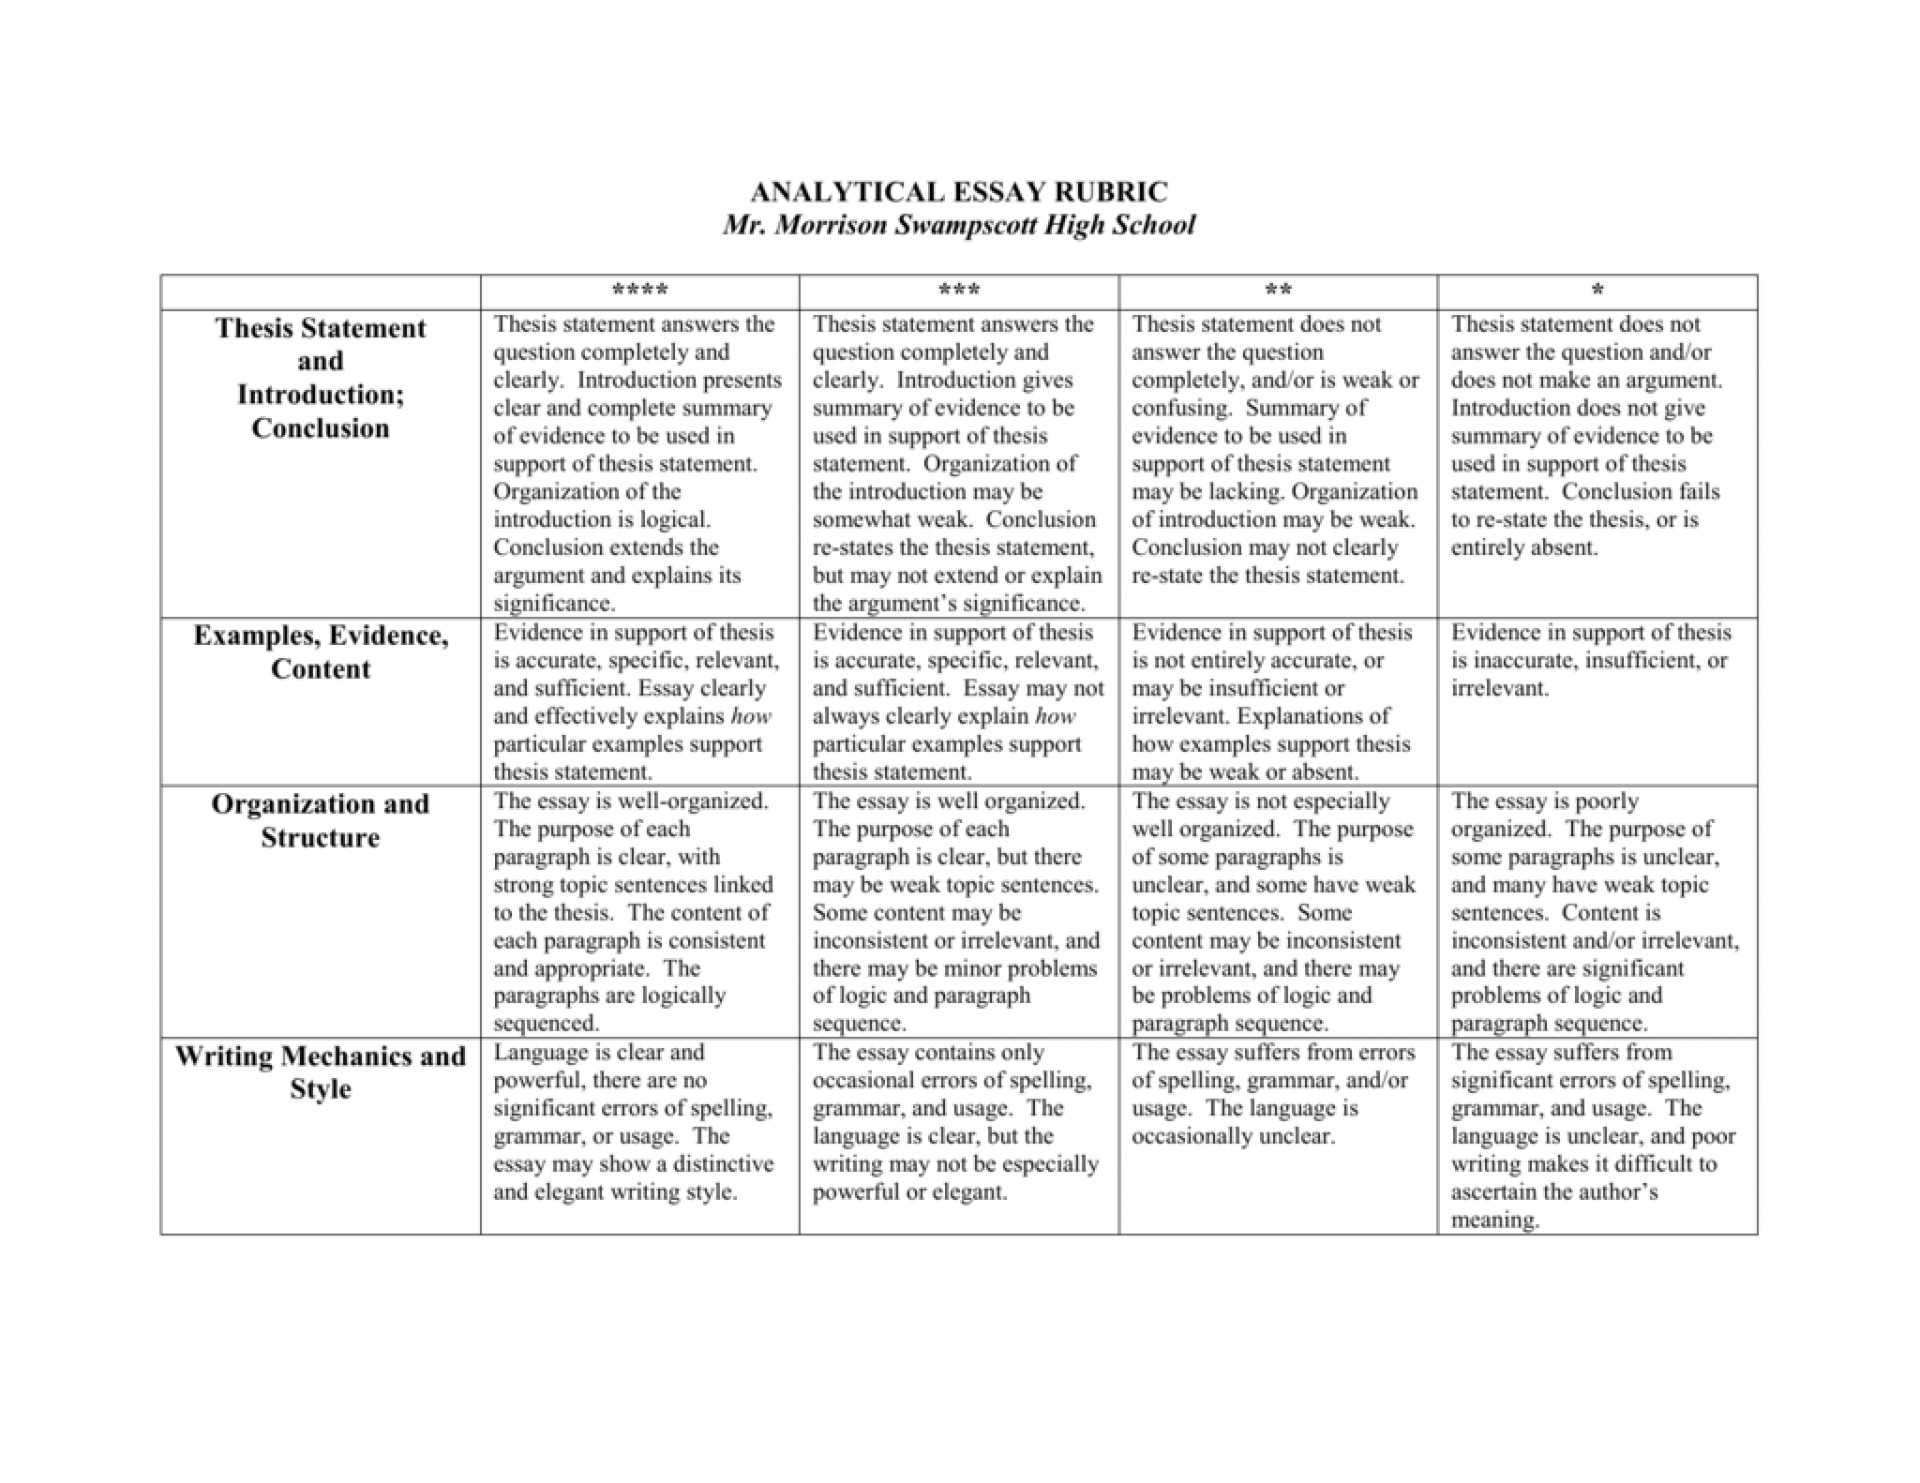 002 Essay Rubric High School Example 007885254 2 Impressive Narrative Analytical Personal 1920